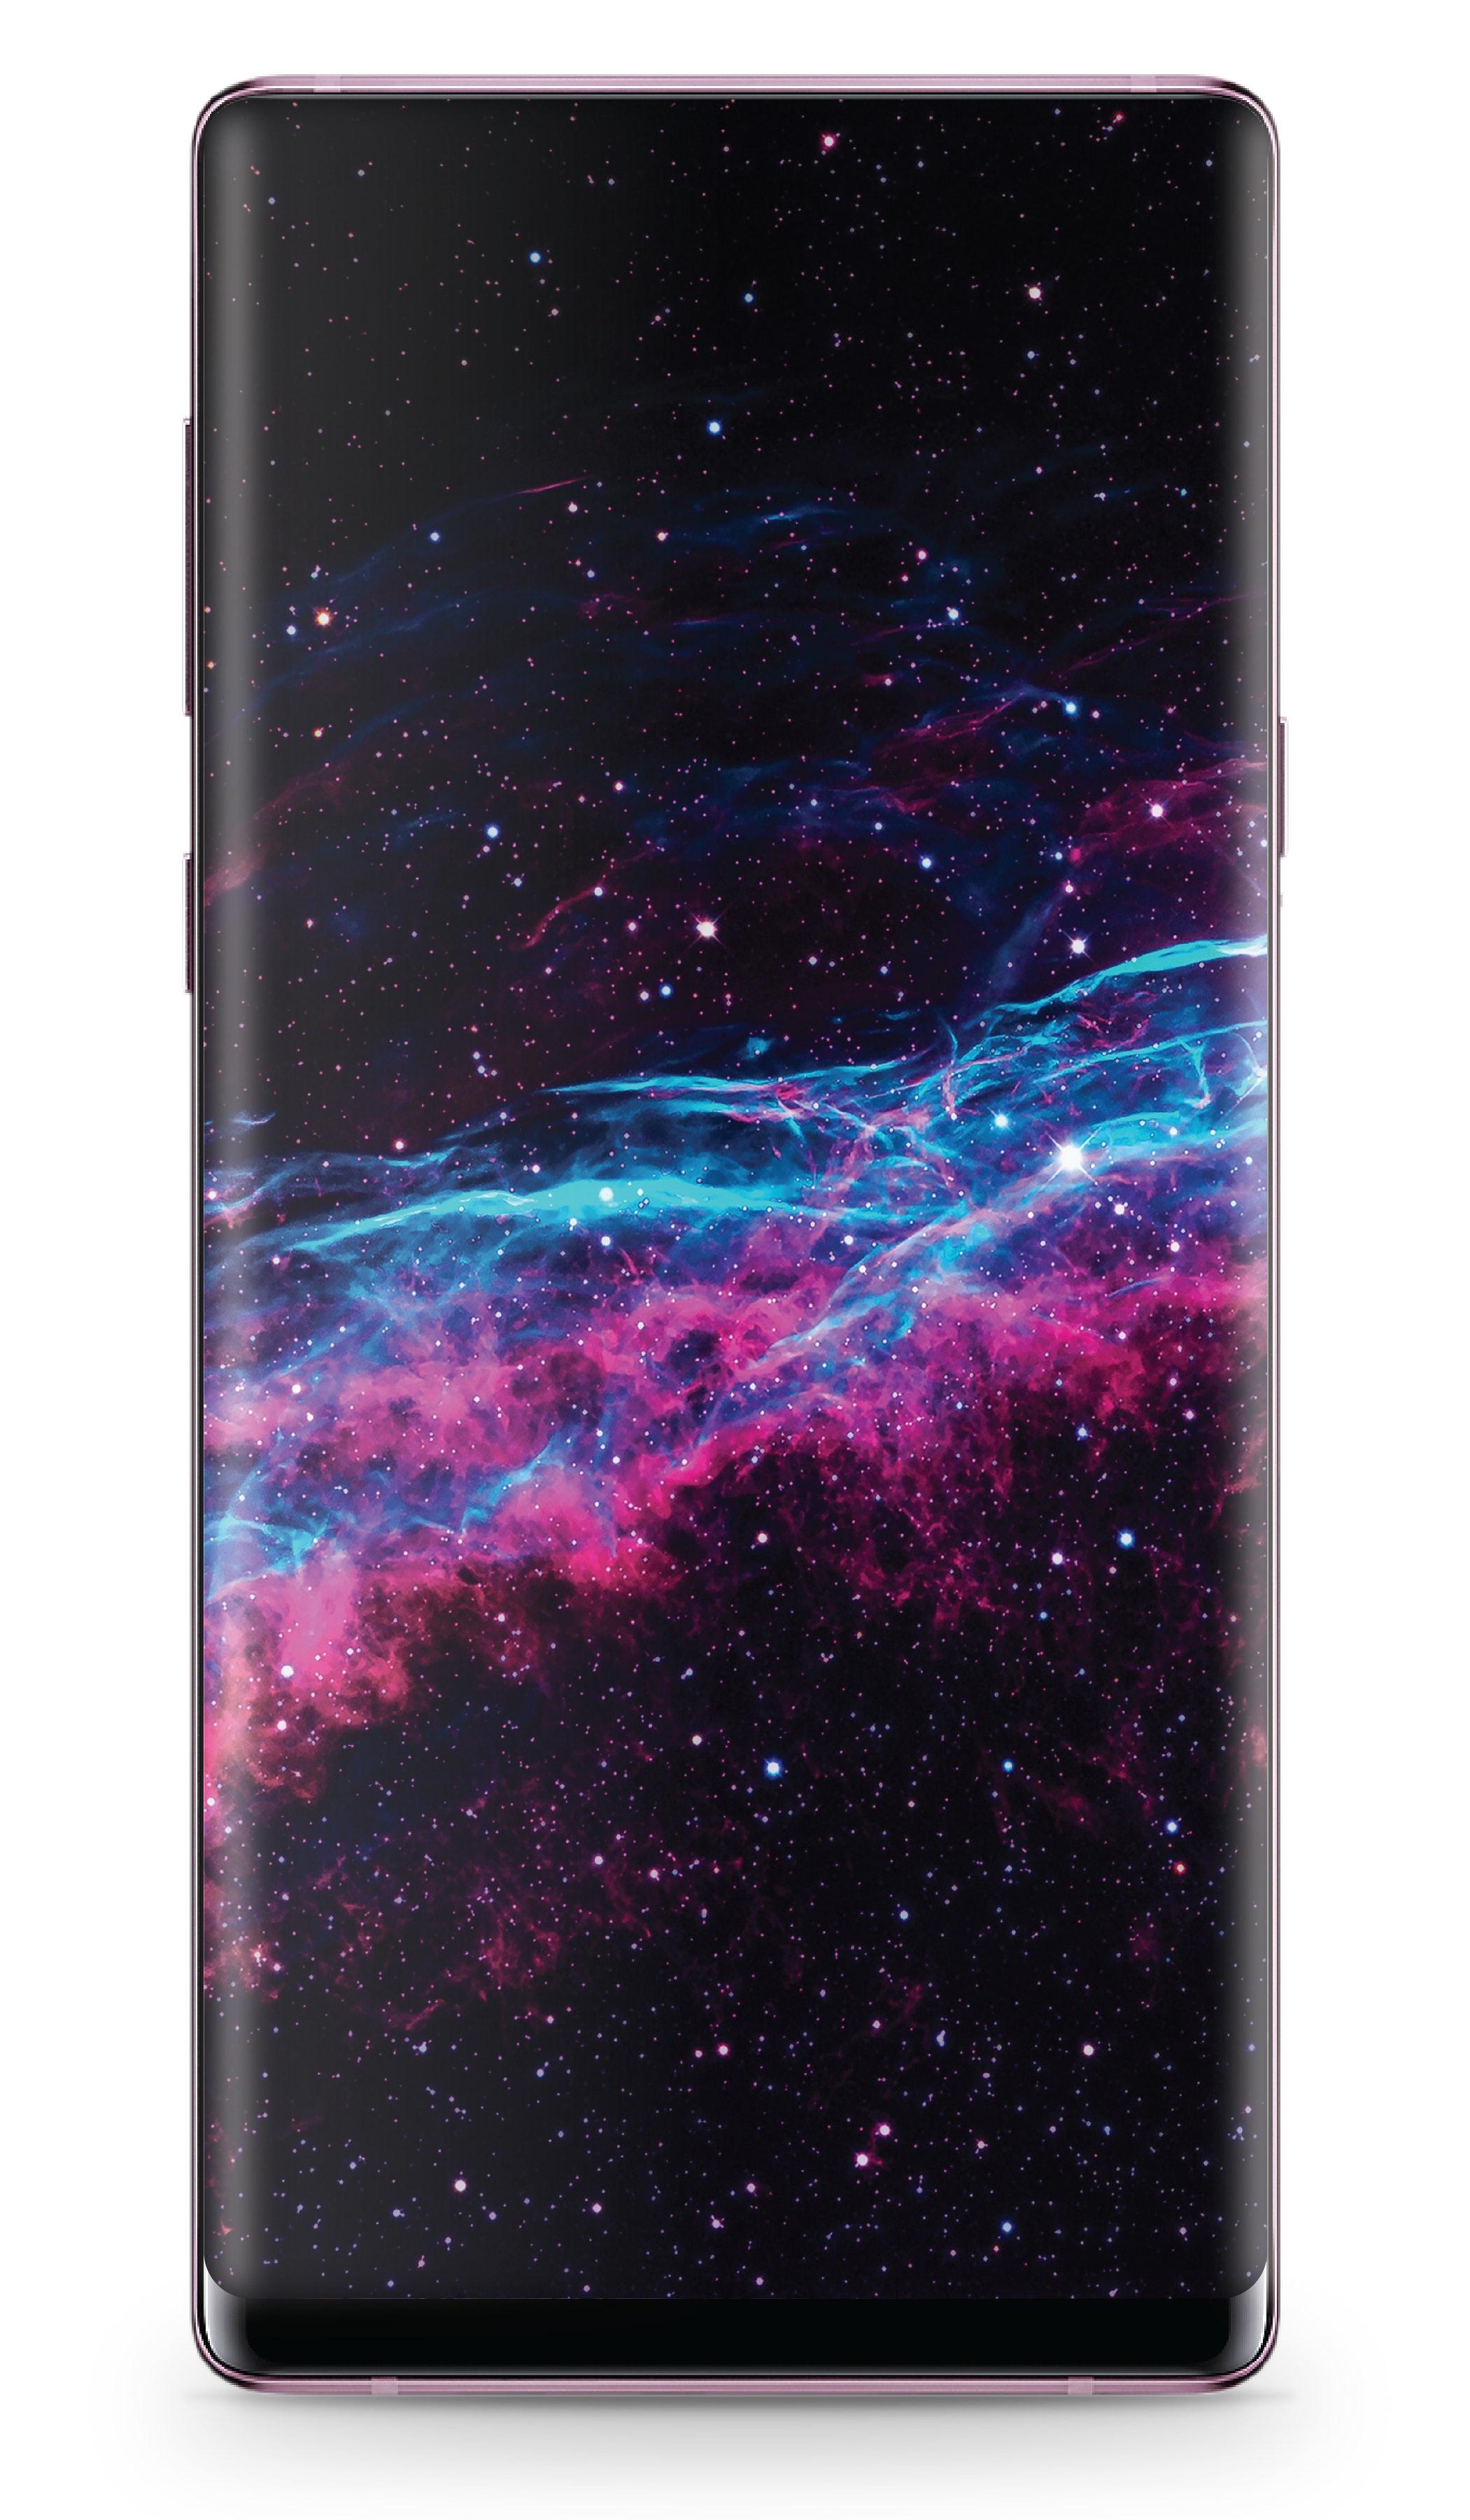 Samsung Galaxy Note9 image